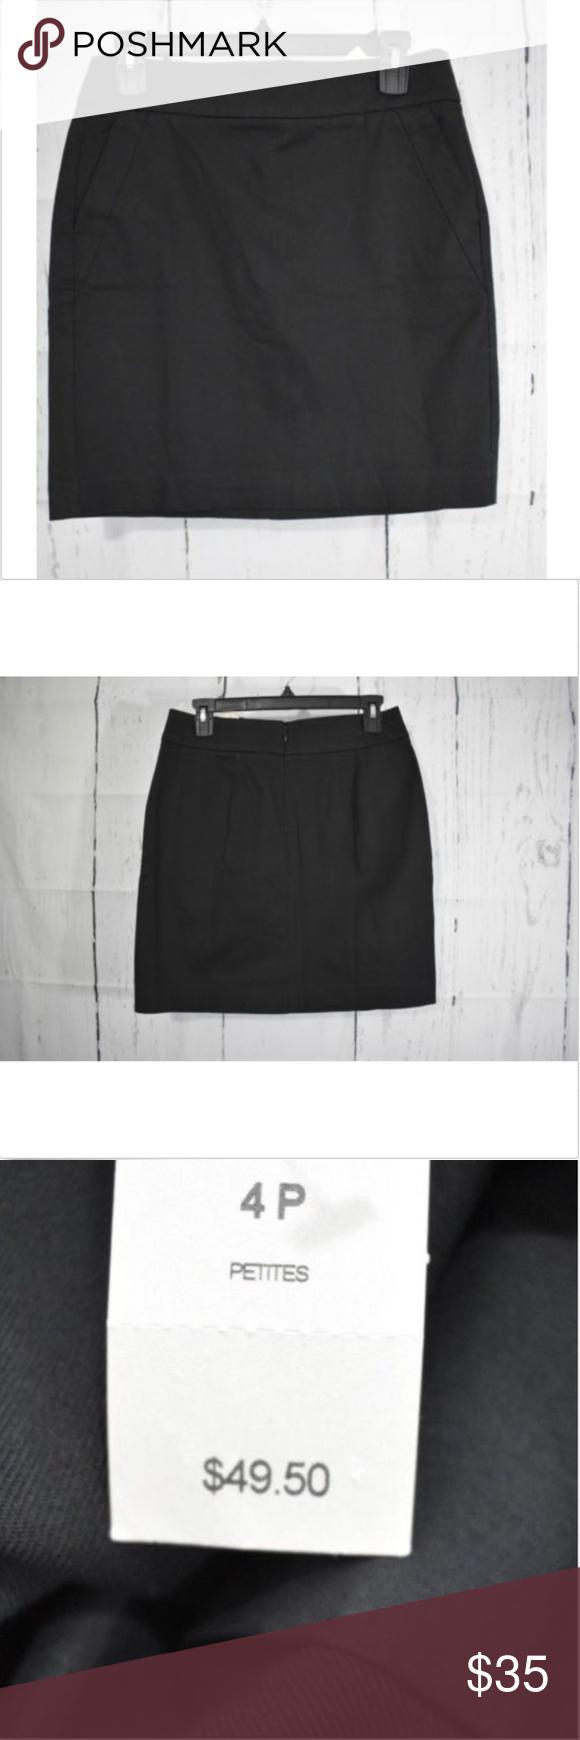 Ann Taylor Classic Black Flat Front Skirt Black flats